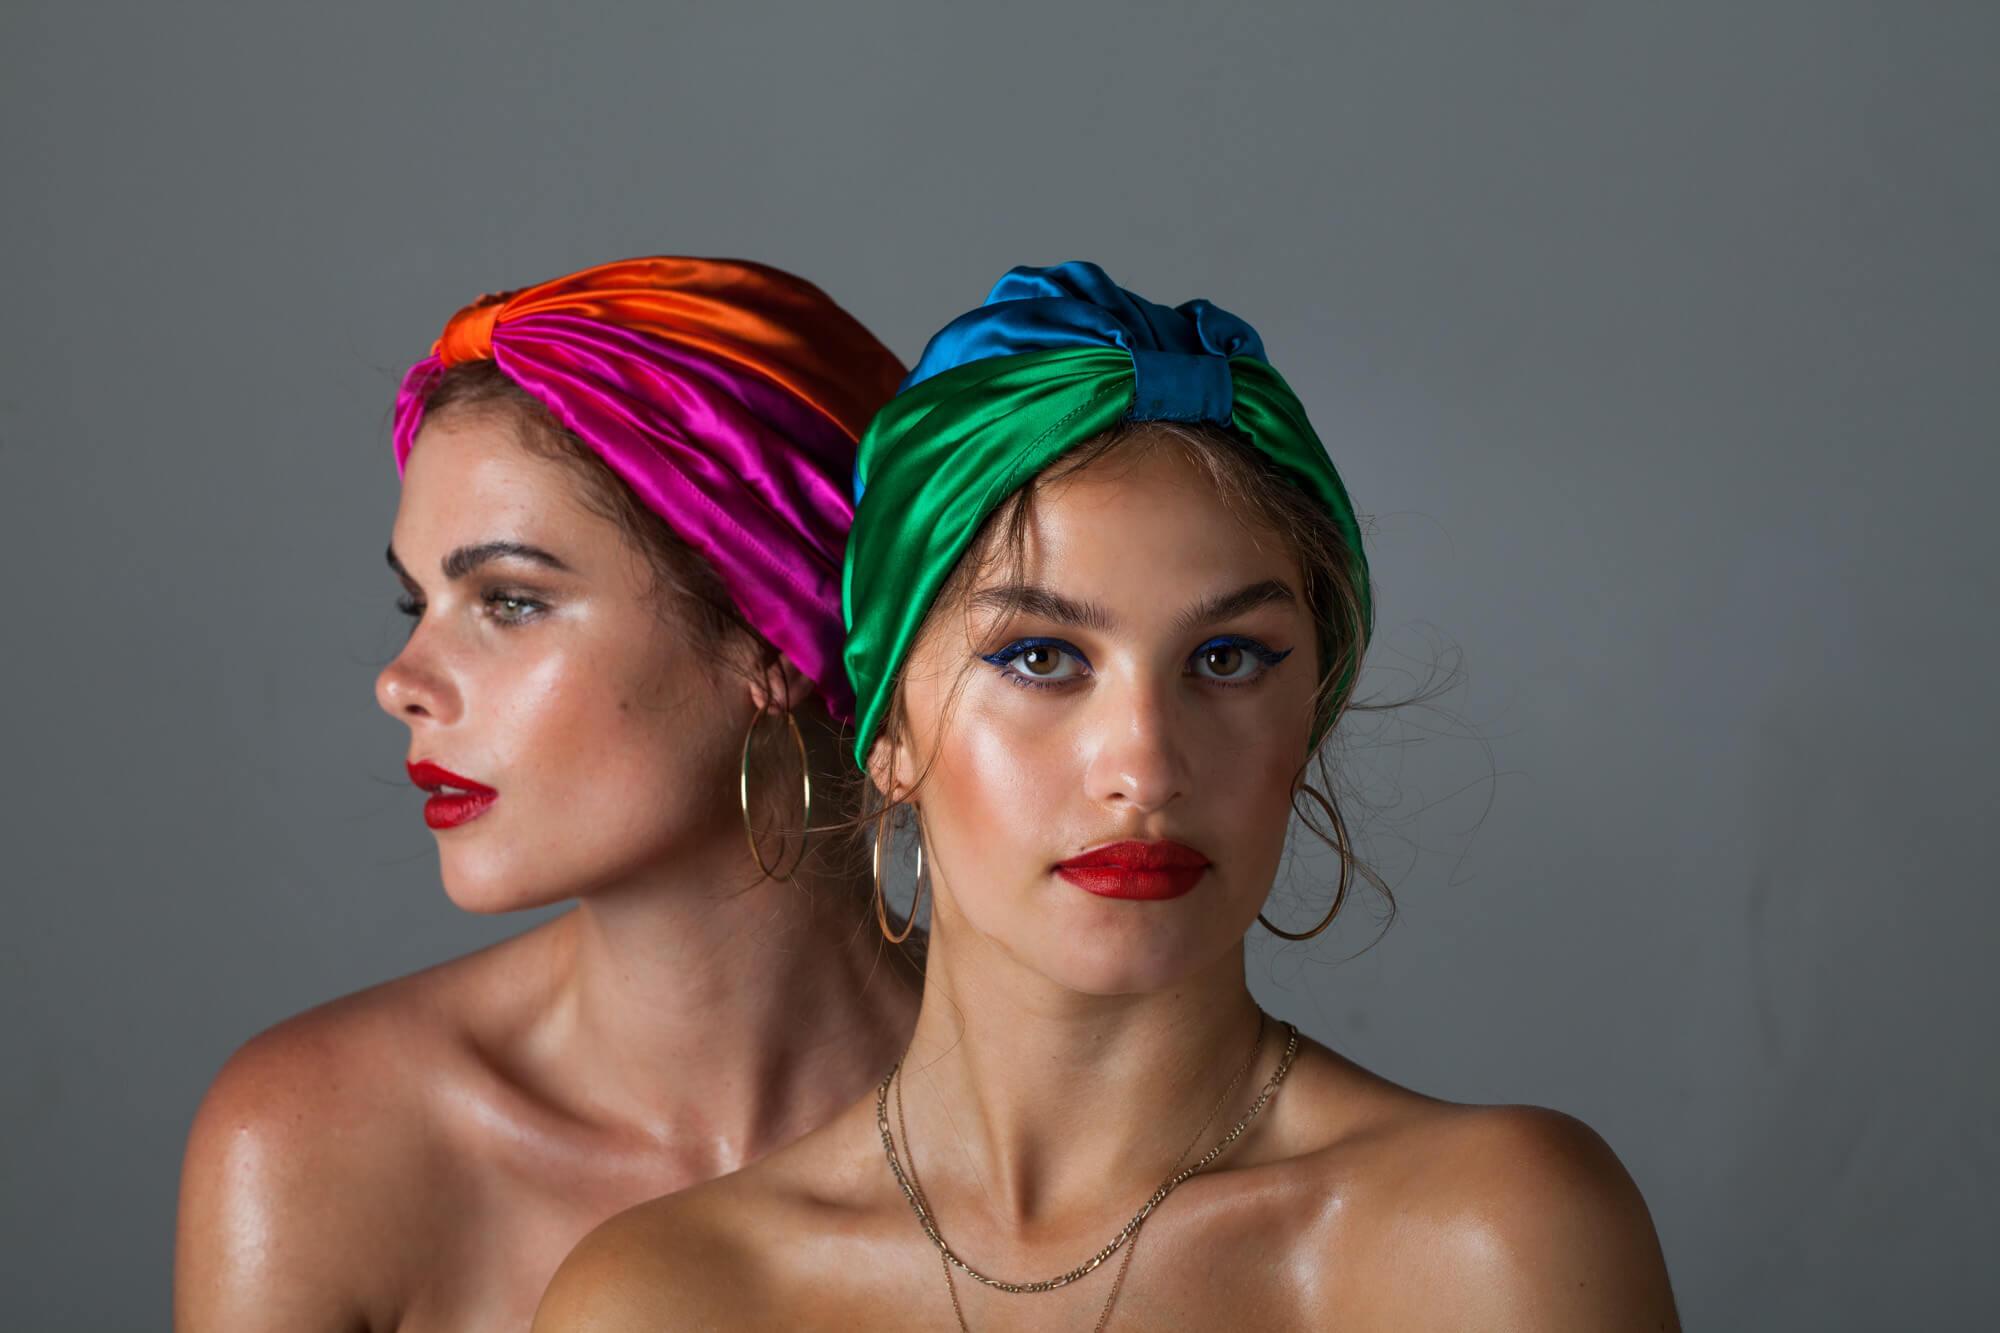 Models, Dorset- Beauty photographer